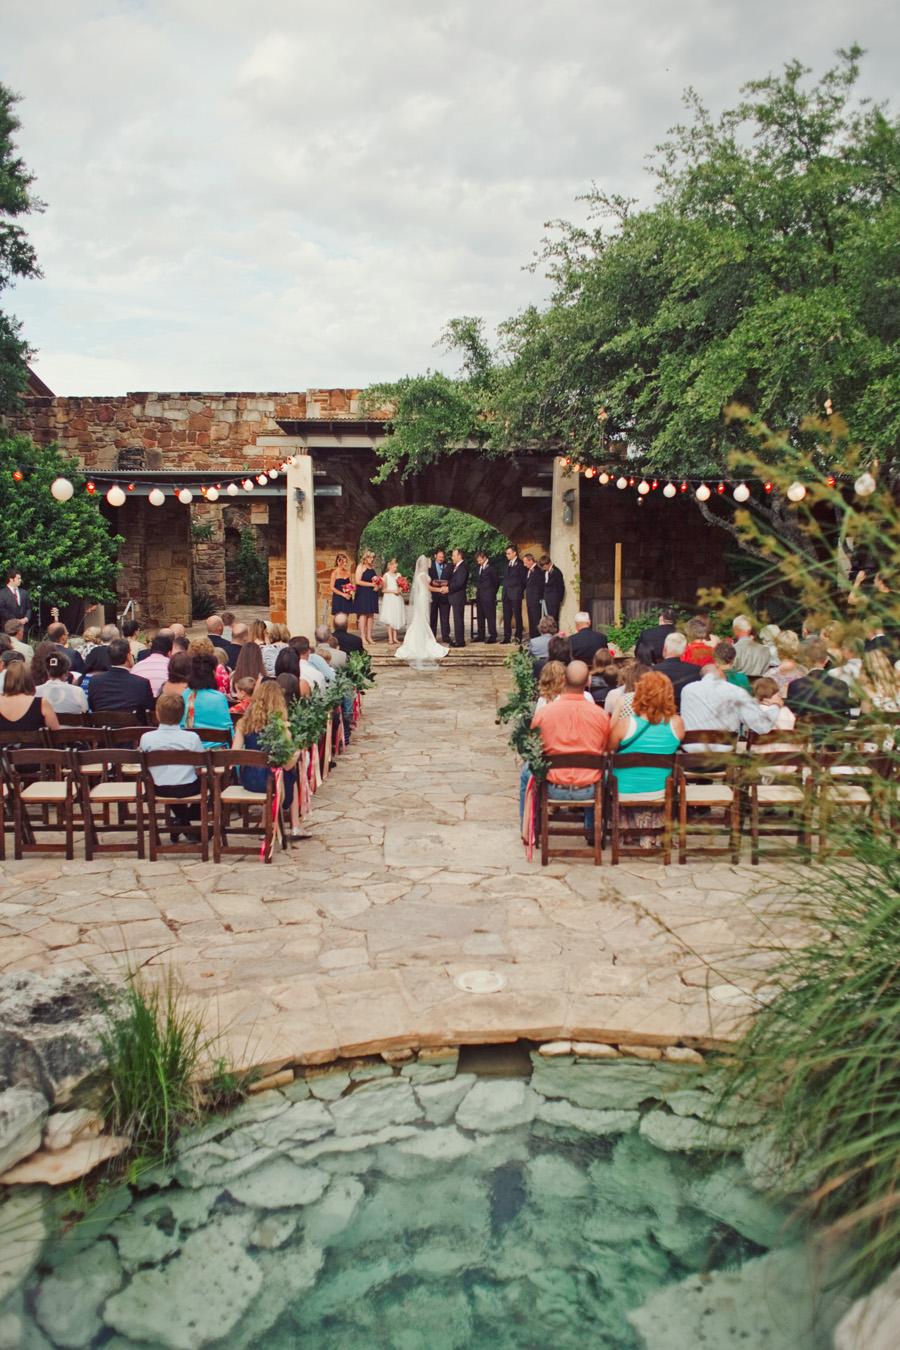 Austin Texas Garden Wedding Venue - Elizabeth Anne Designs The Wedding Blog